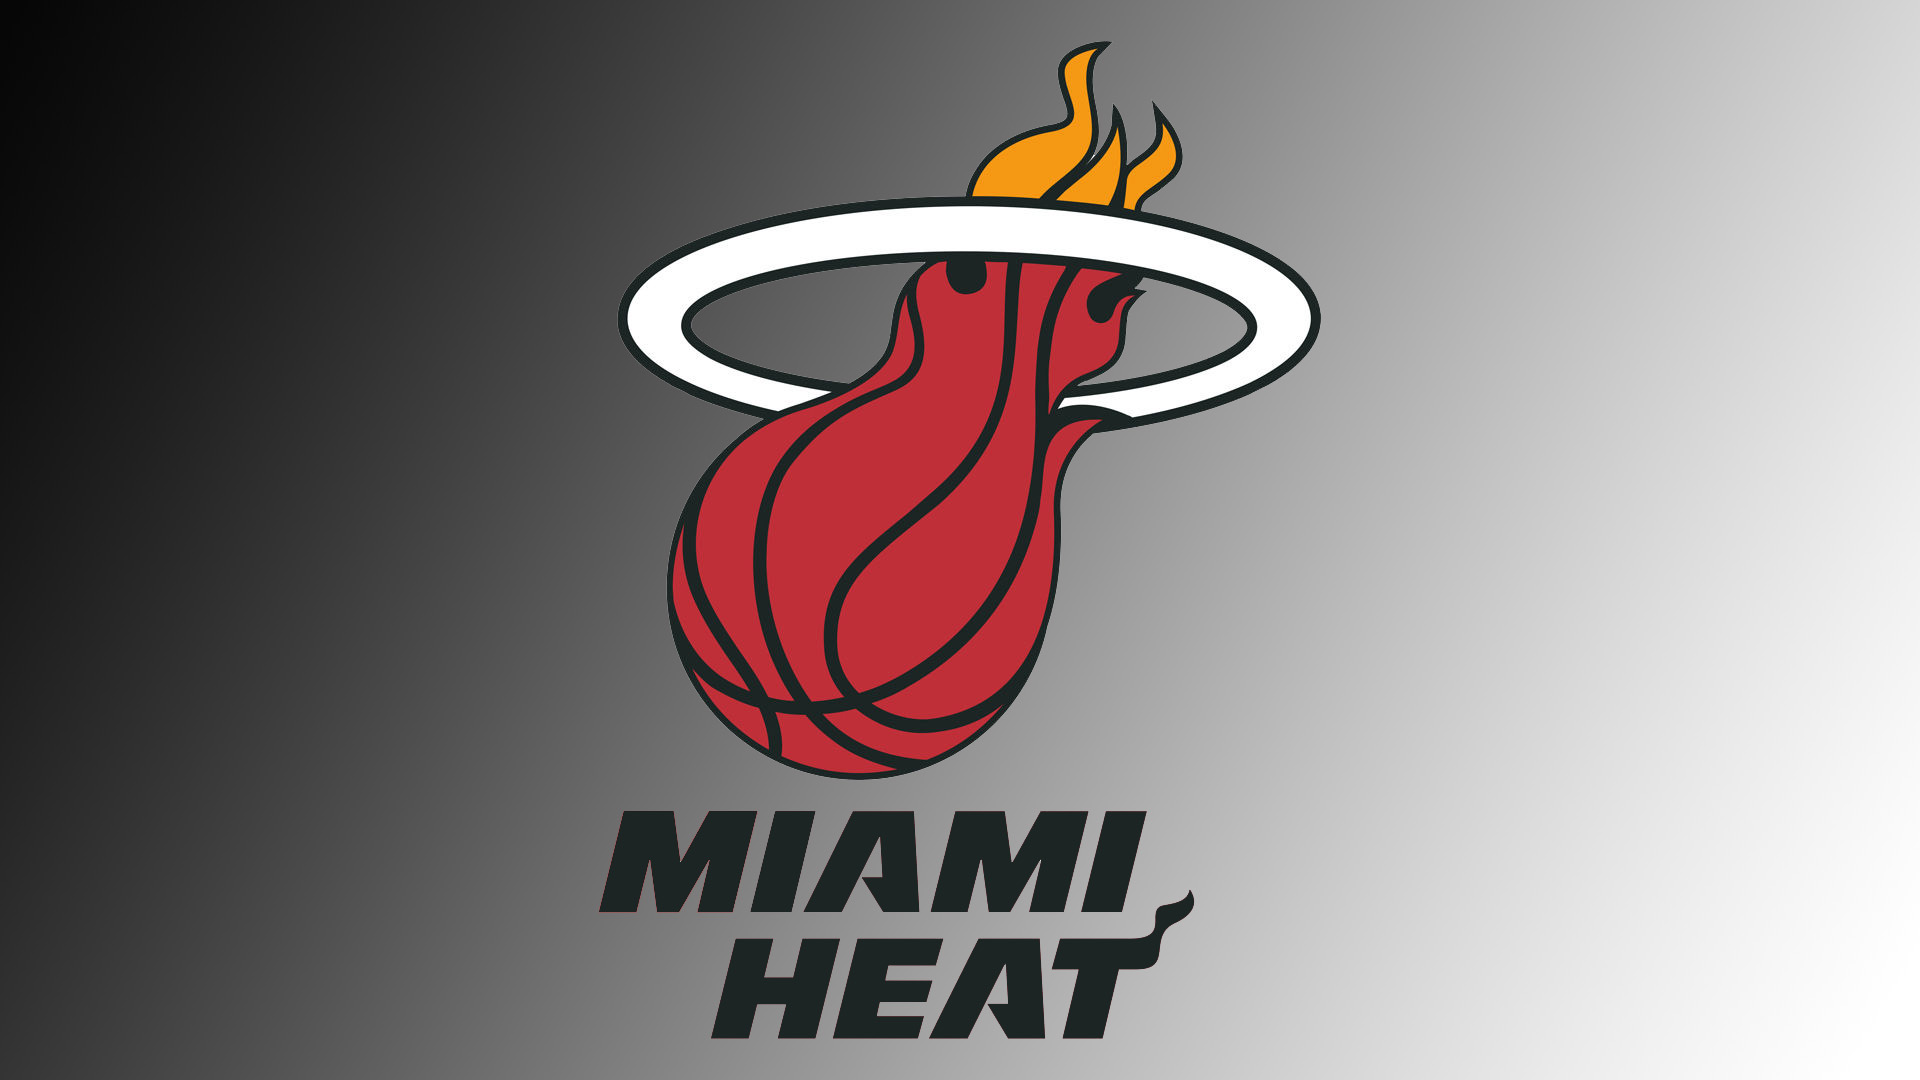 Miami Heat Logo Wallpaper HD 21 High Resolution Wallpaper Full Size 1920x1080